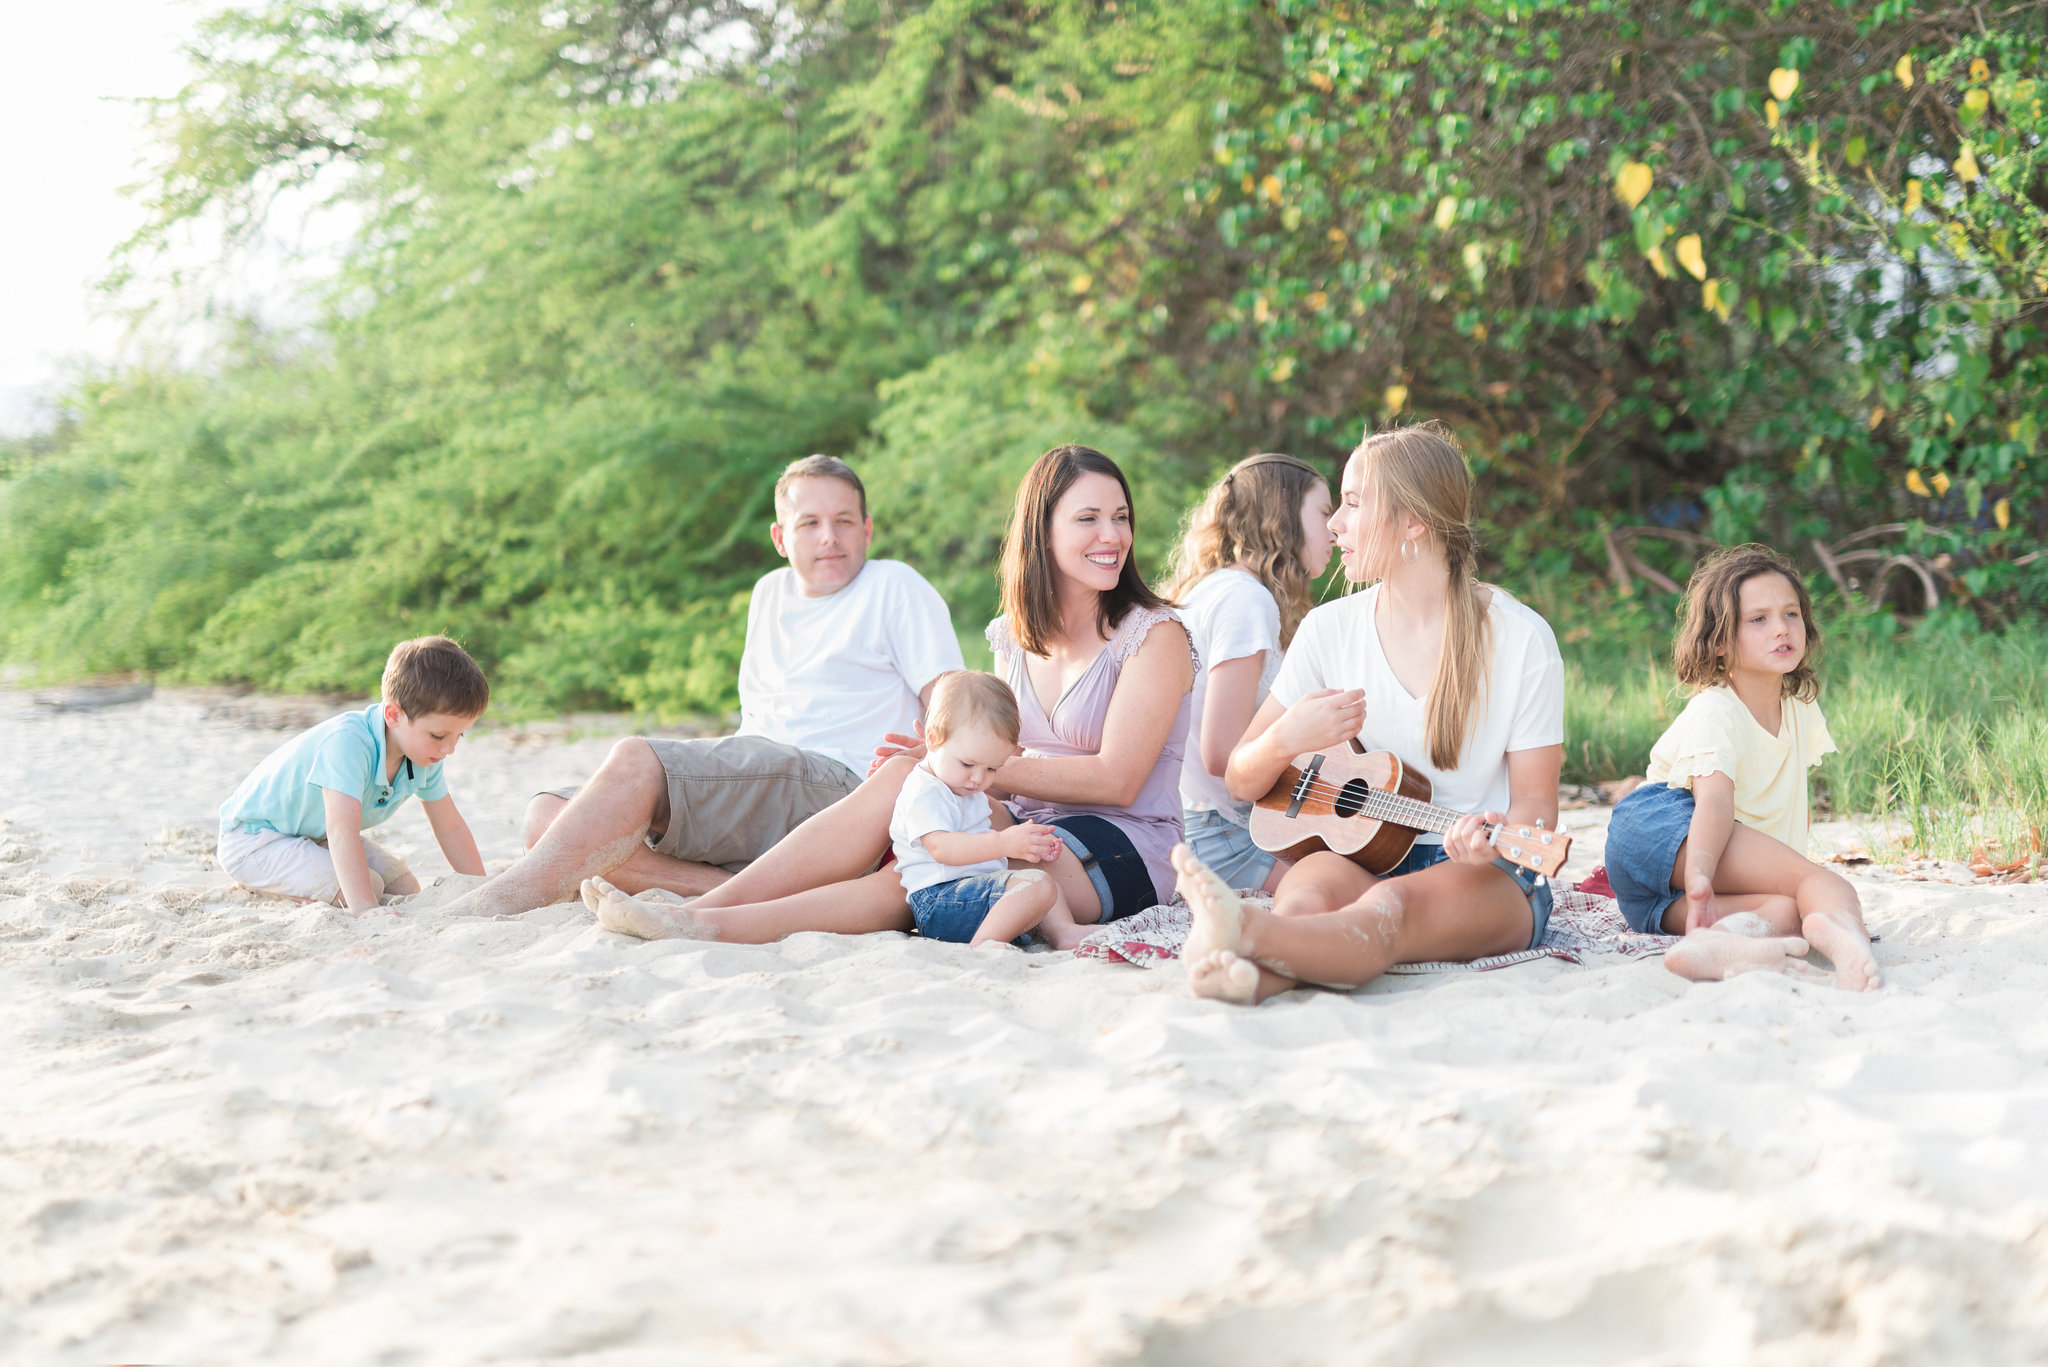 Oahu Family Photographers | Honolulu Beach Lifestyle Session